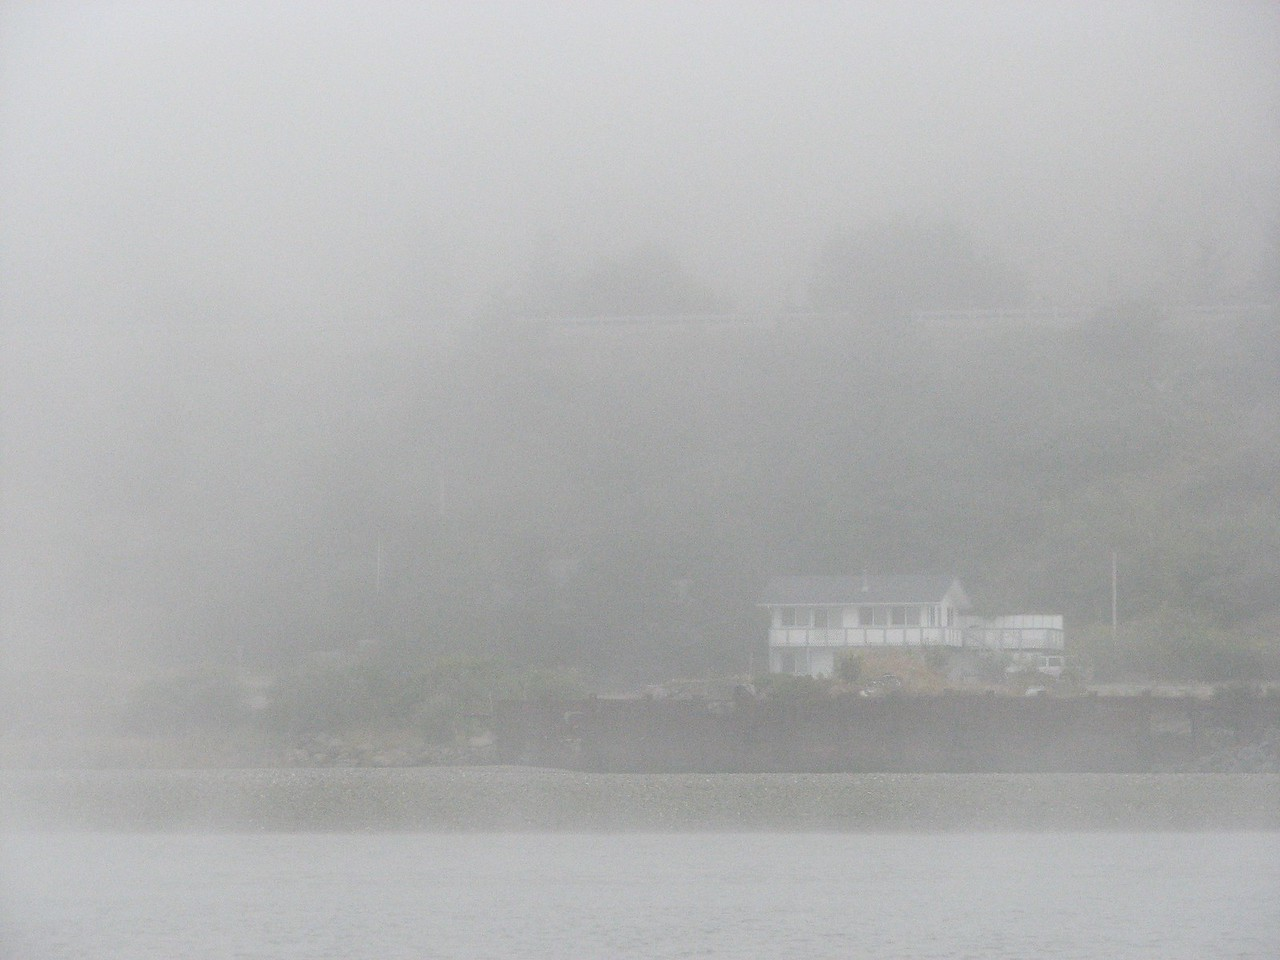 Fog as we leave the docks.